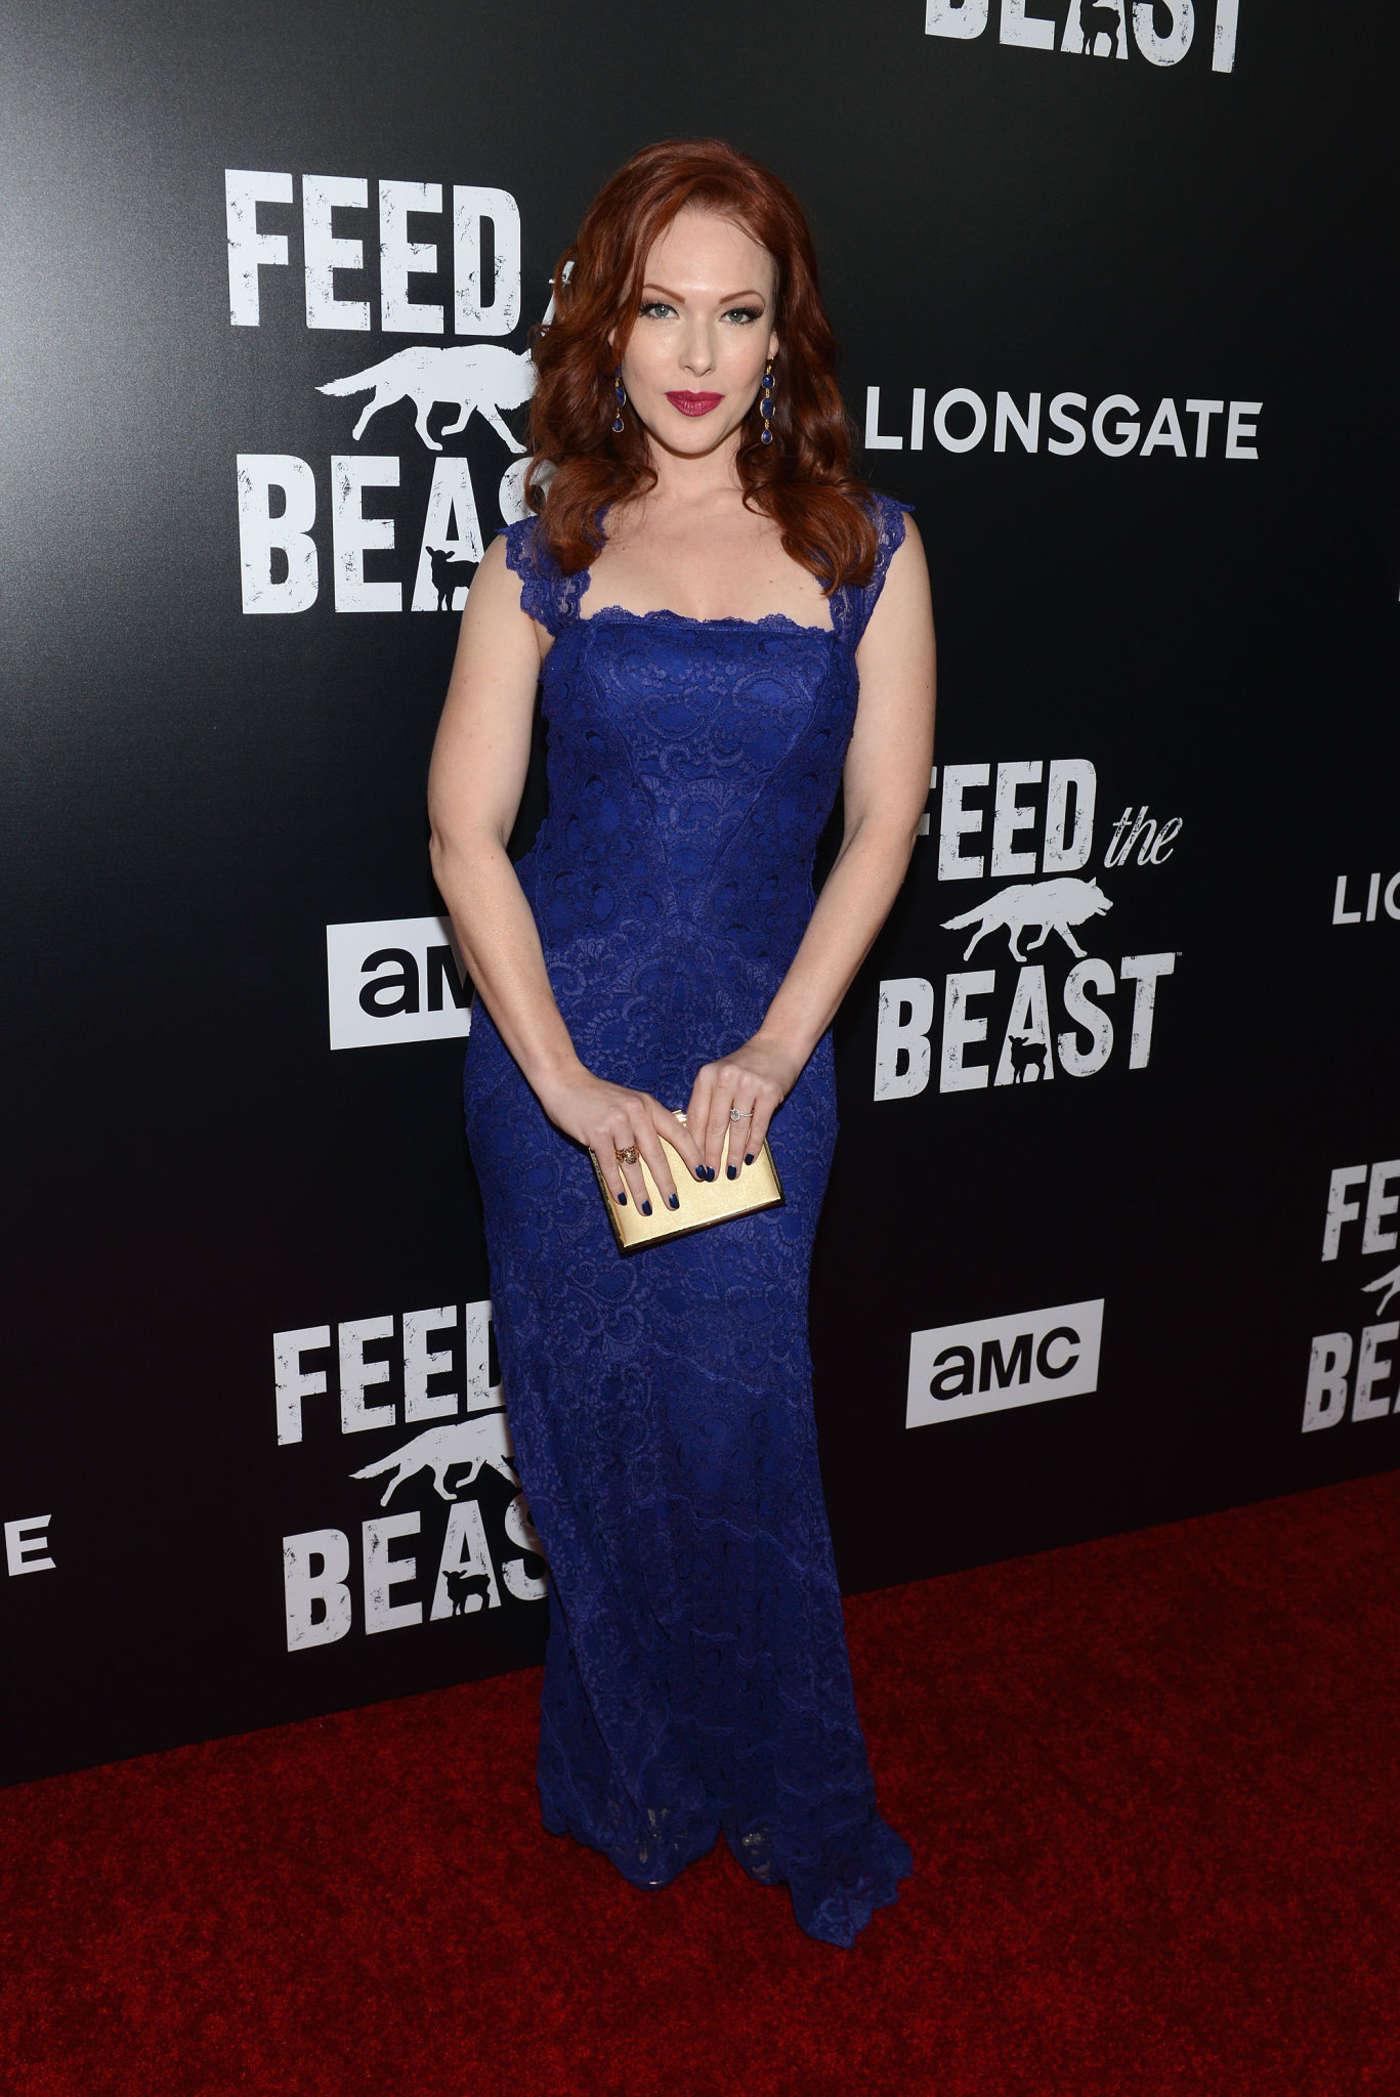 Erin Cummings 2016 : Erin Cummings: Feed The Beast NY Premiere -03